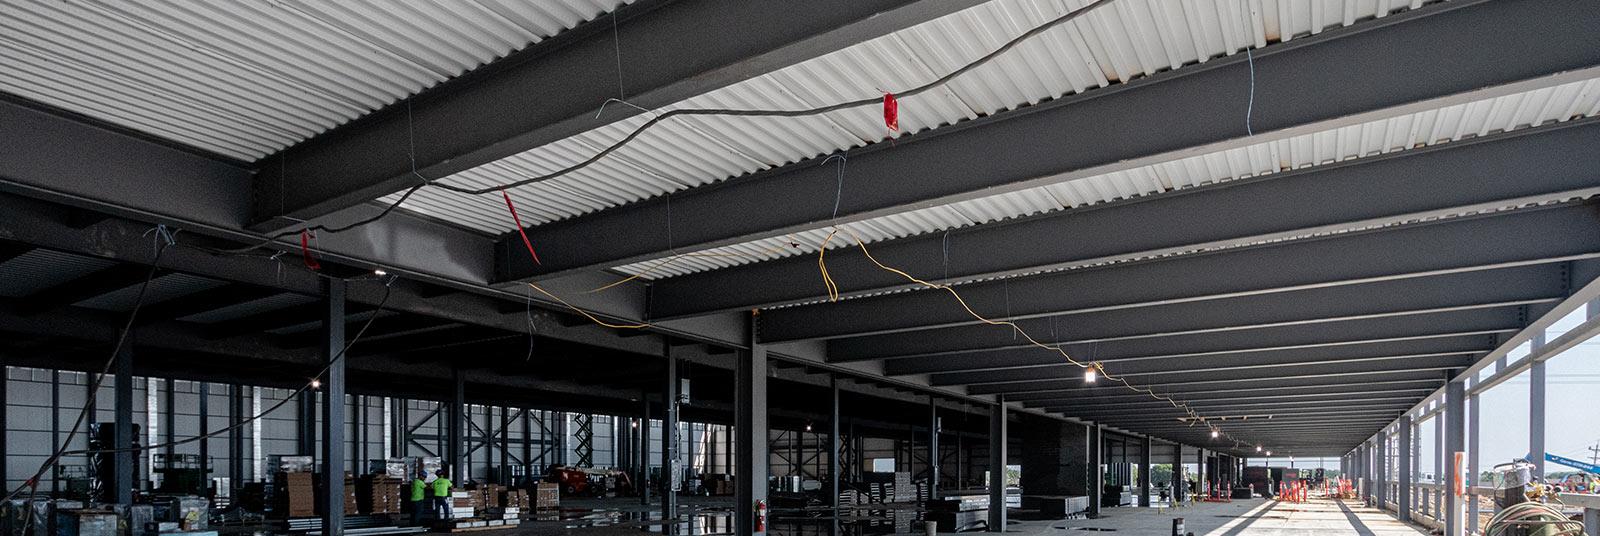 Interior progress at the FESTO industrial facility expansion in Mason, Ohio.